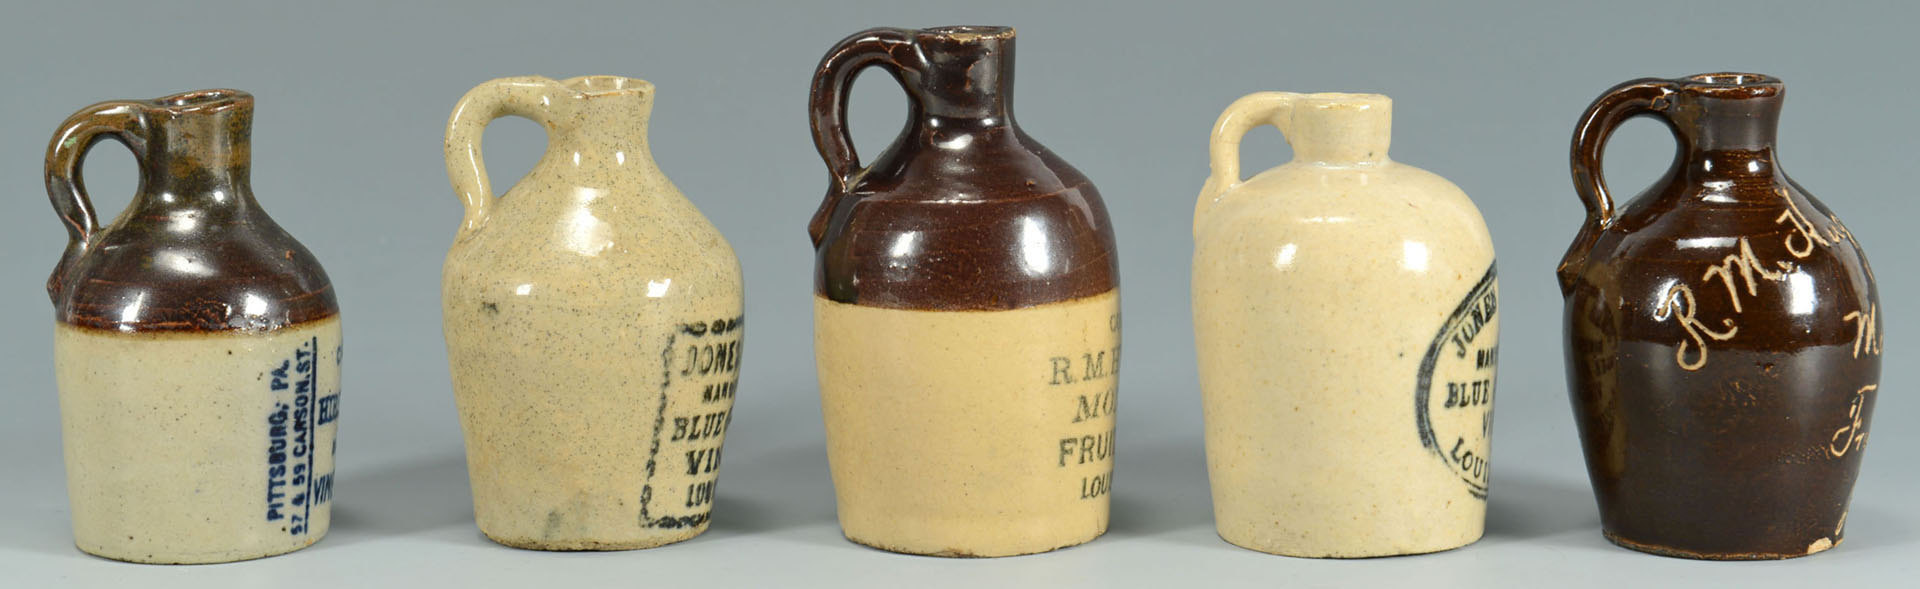 Lot 553: 5 Miniature Vinegar Jugs, Louisville, Kentucky